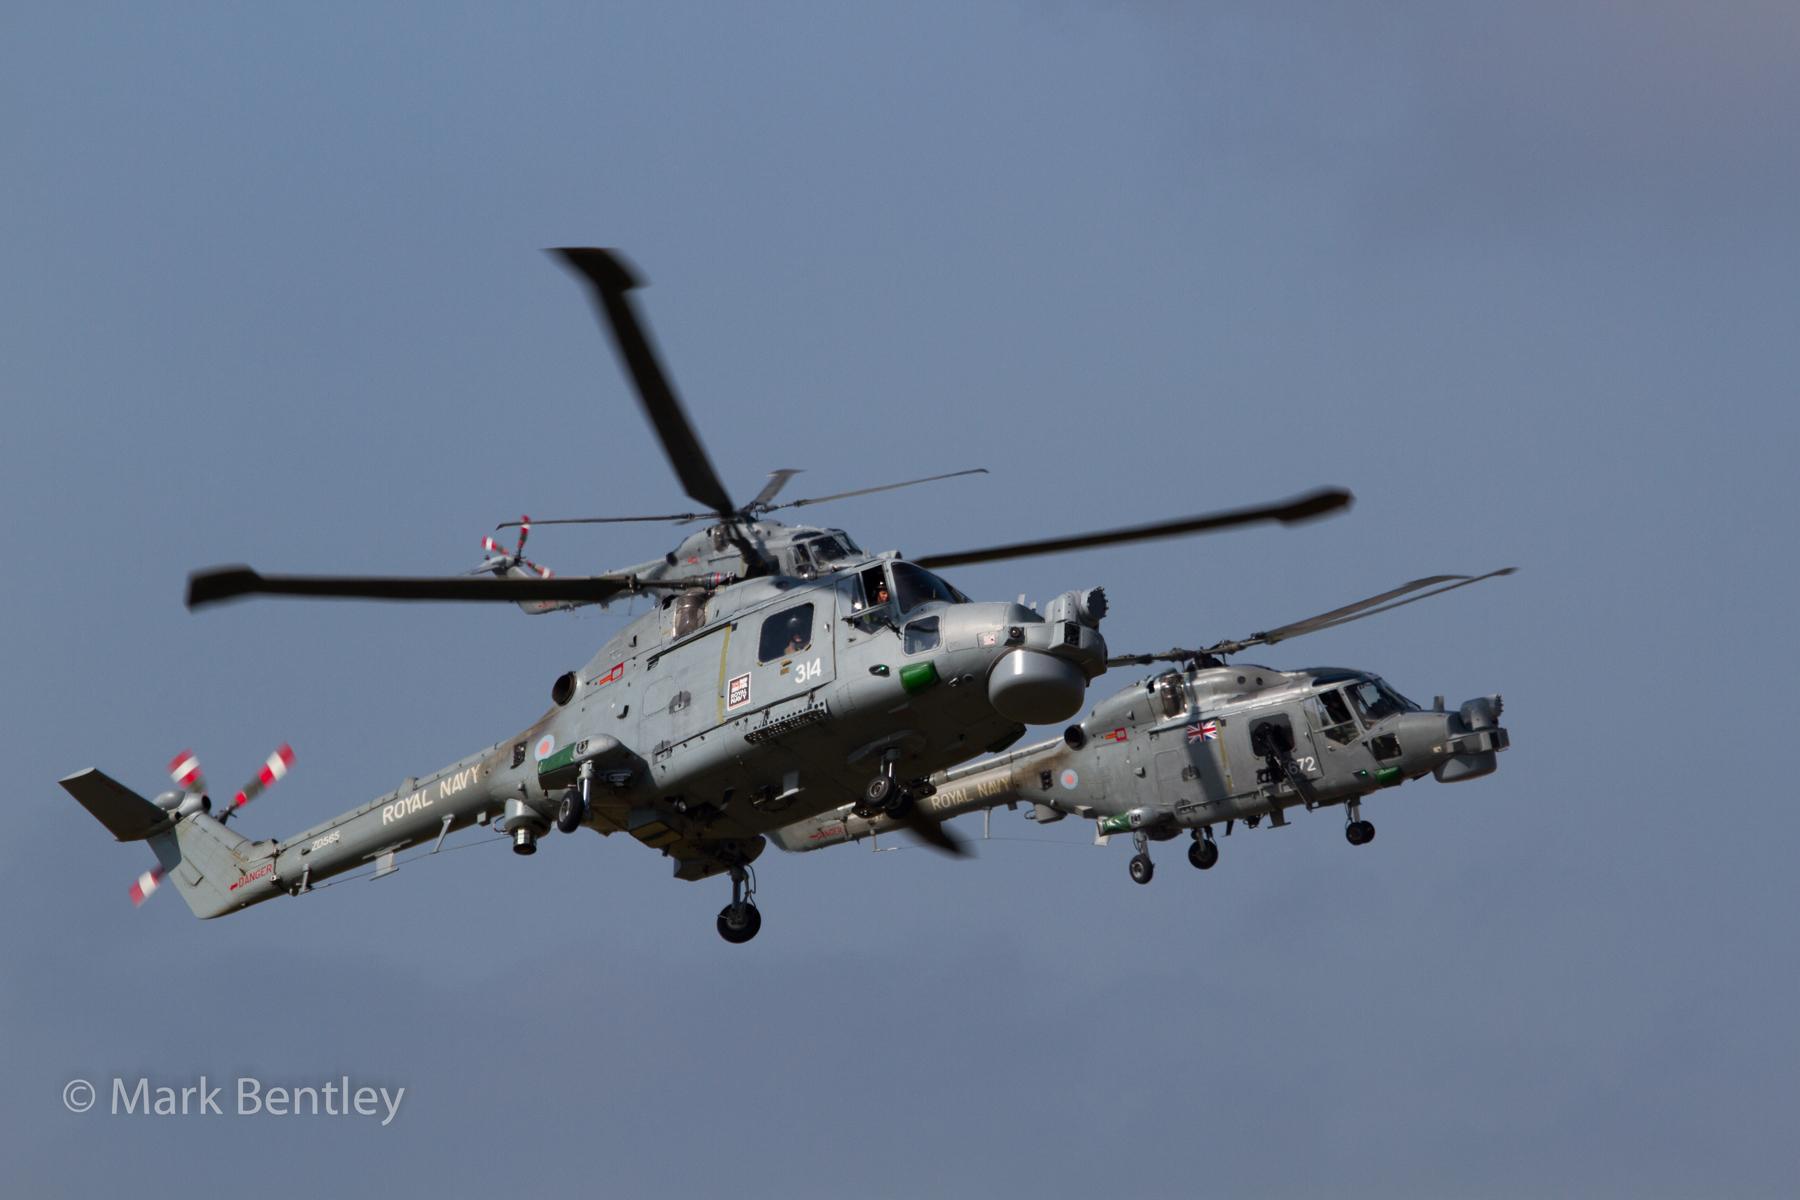 B009 Royal Navy Lynx